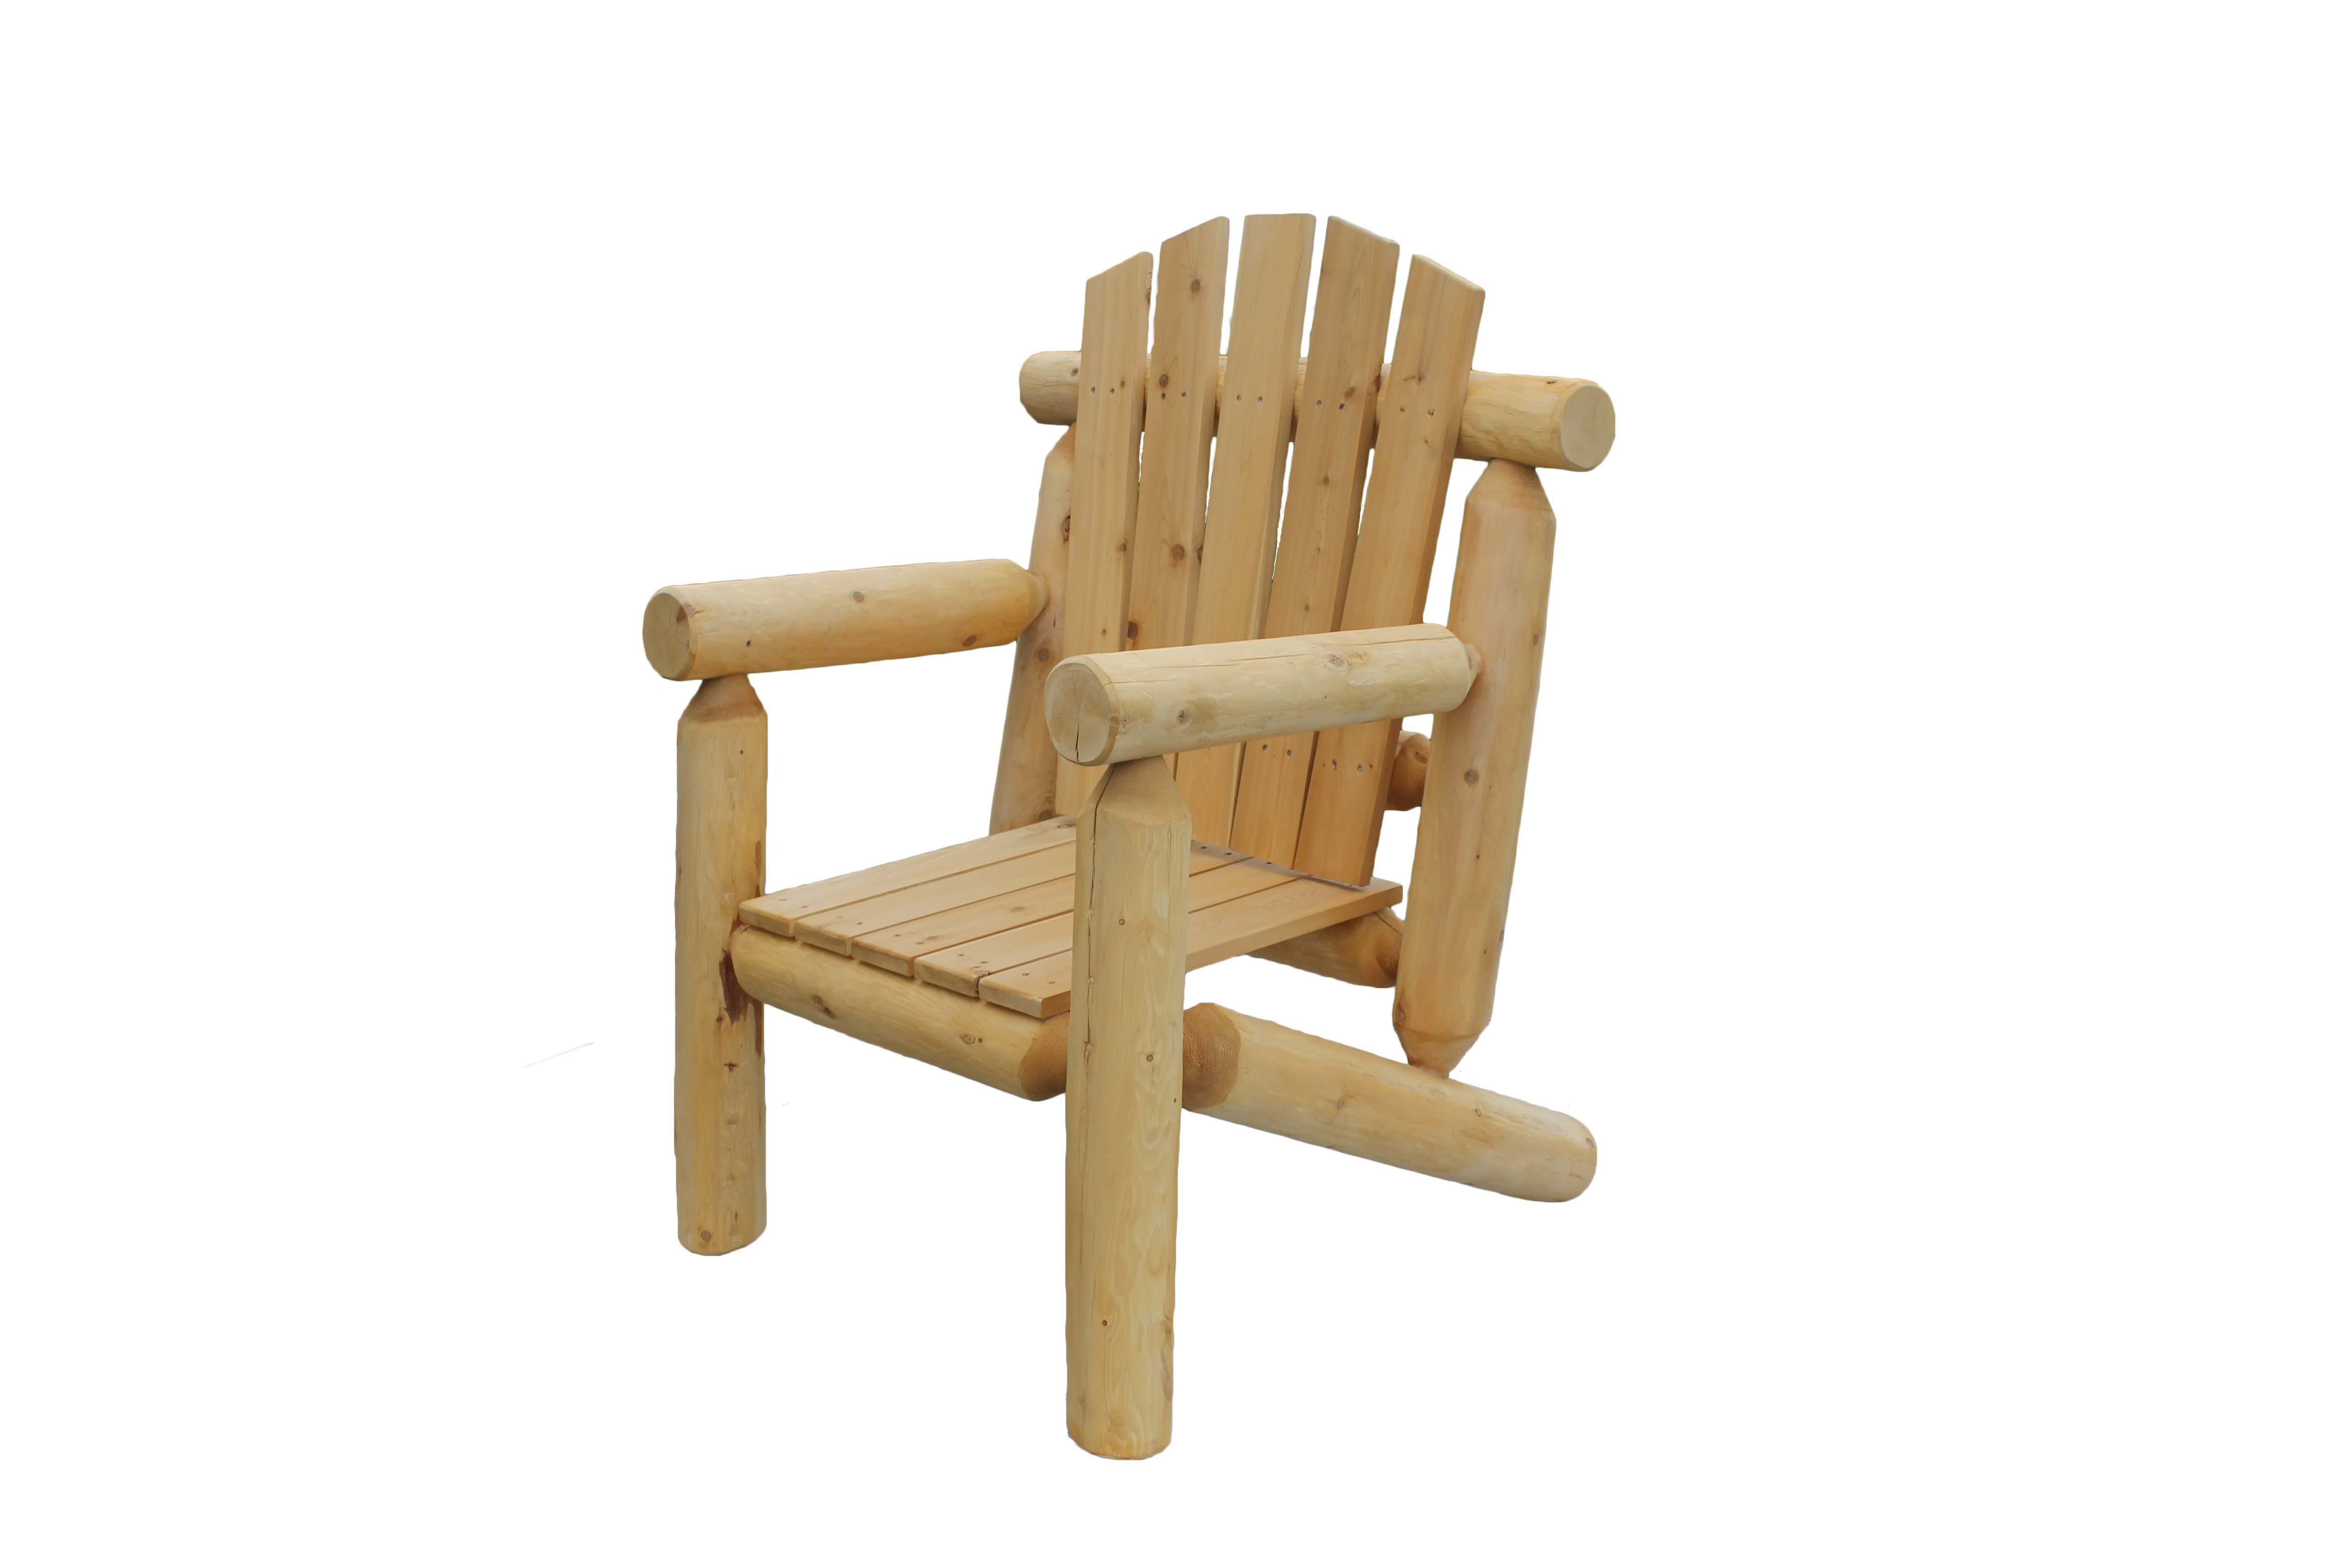 adirondack chair photo frame baseball bean bag target wood outdoor furniture and lawn decor  the barn raiser